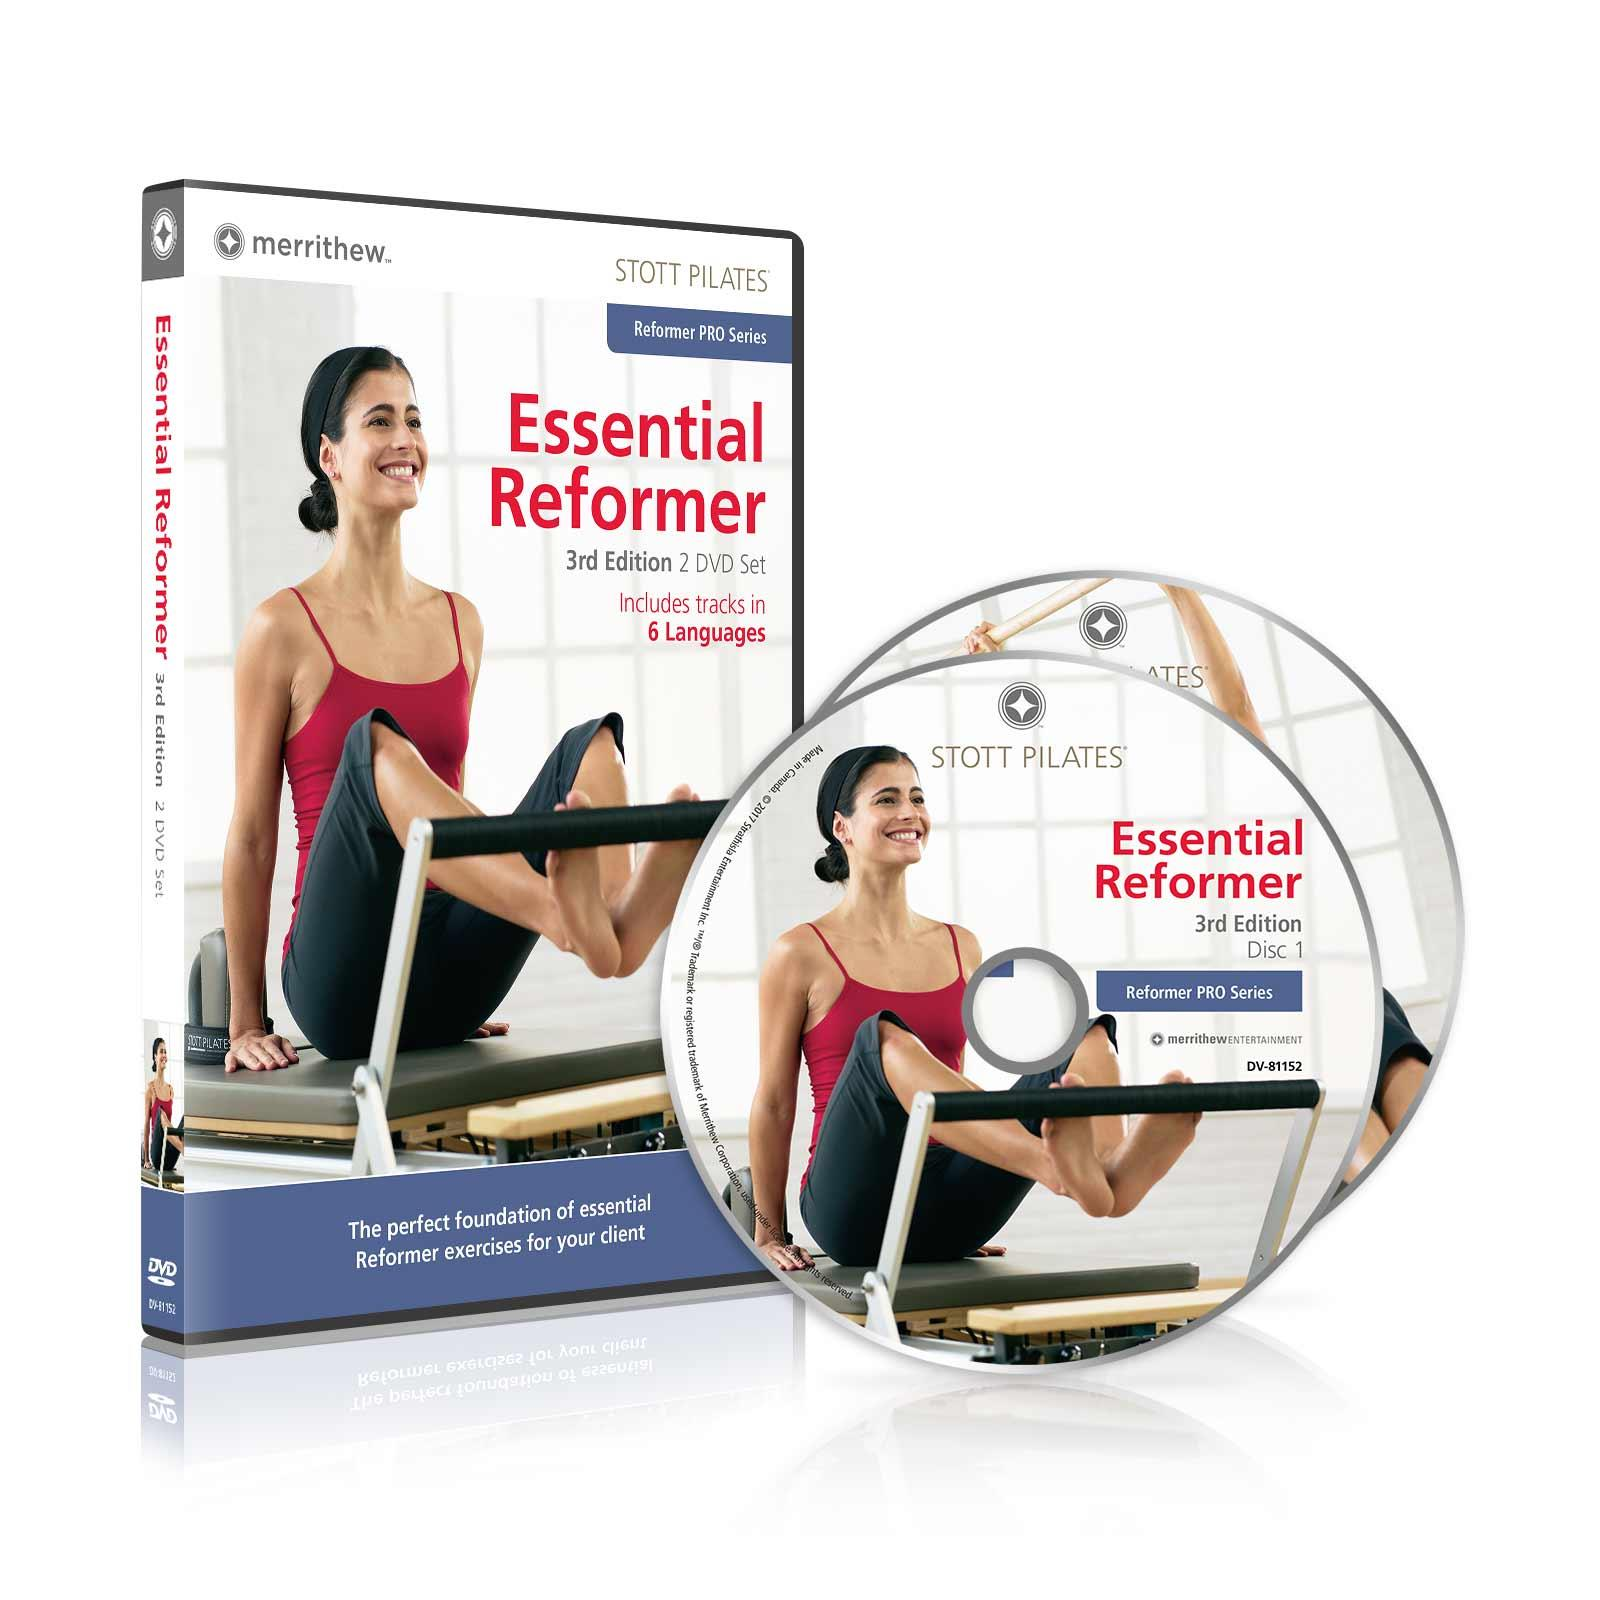 DVD - Essential Reformer 2-DVD Set